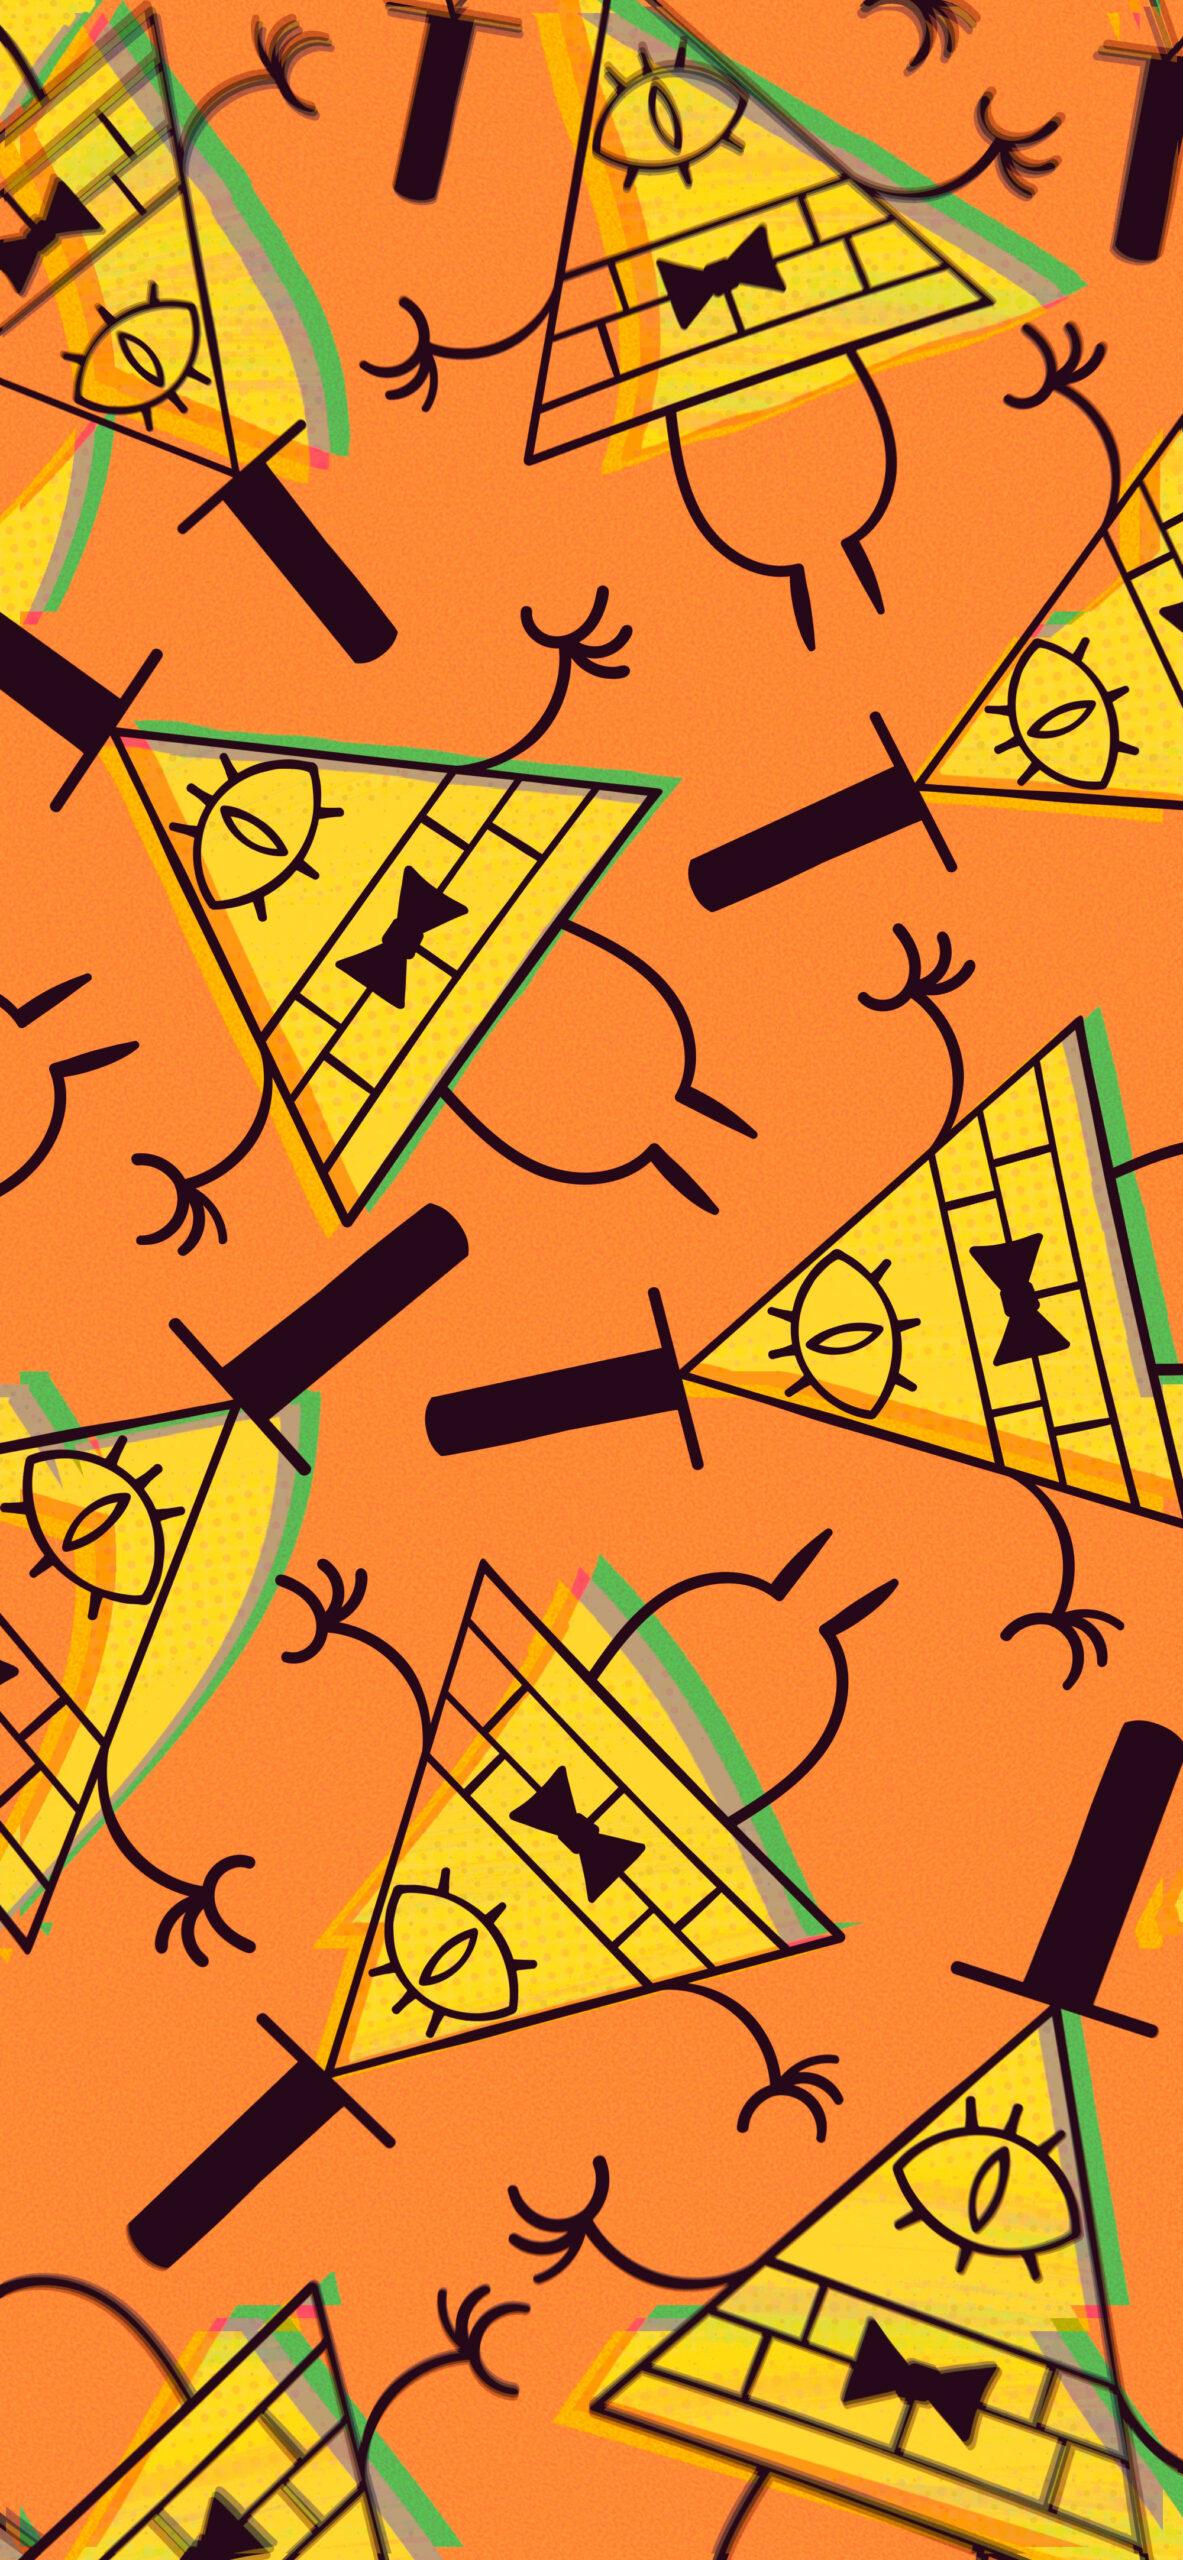 gravity falls bill cipher art orange wallpaper